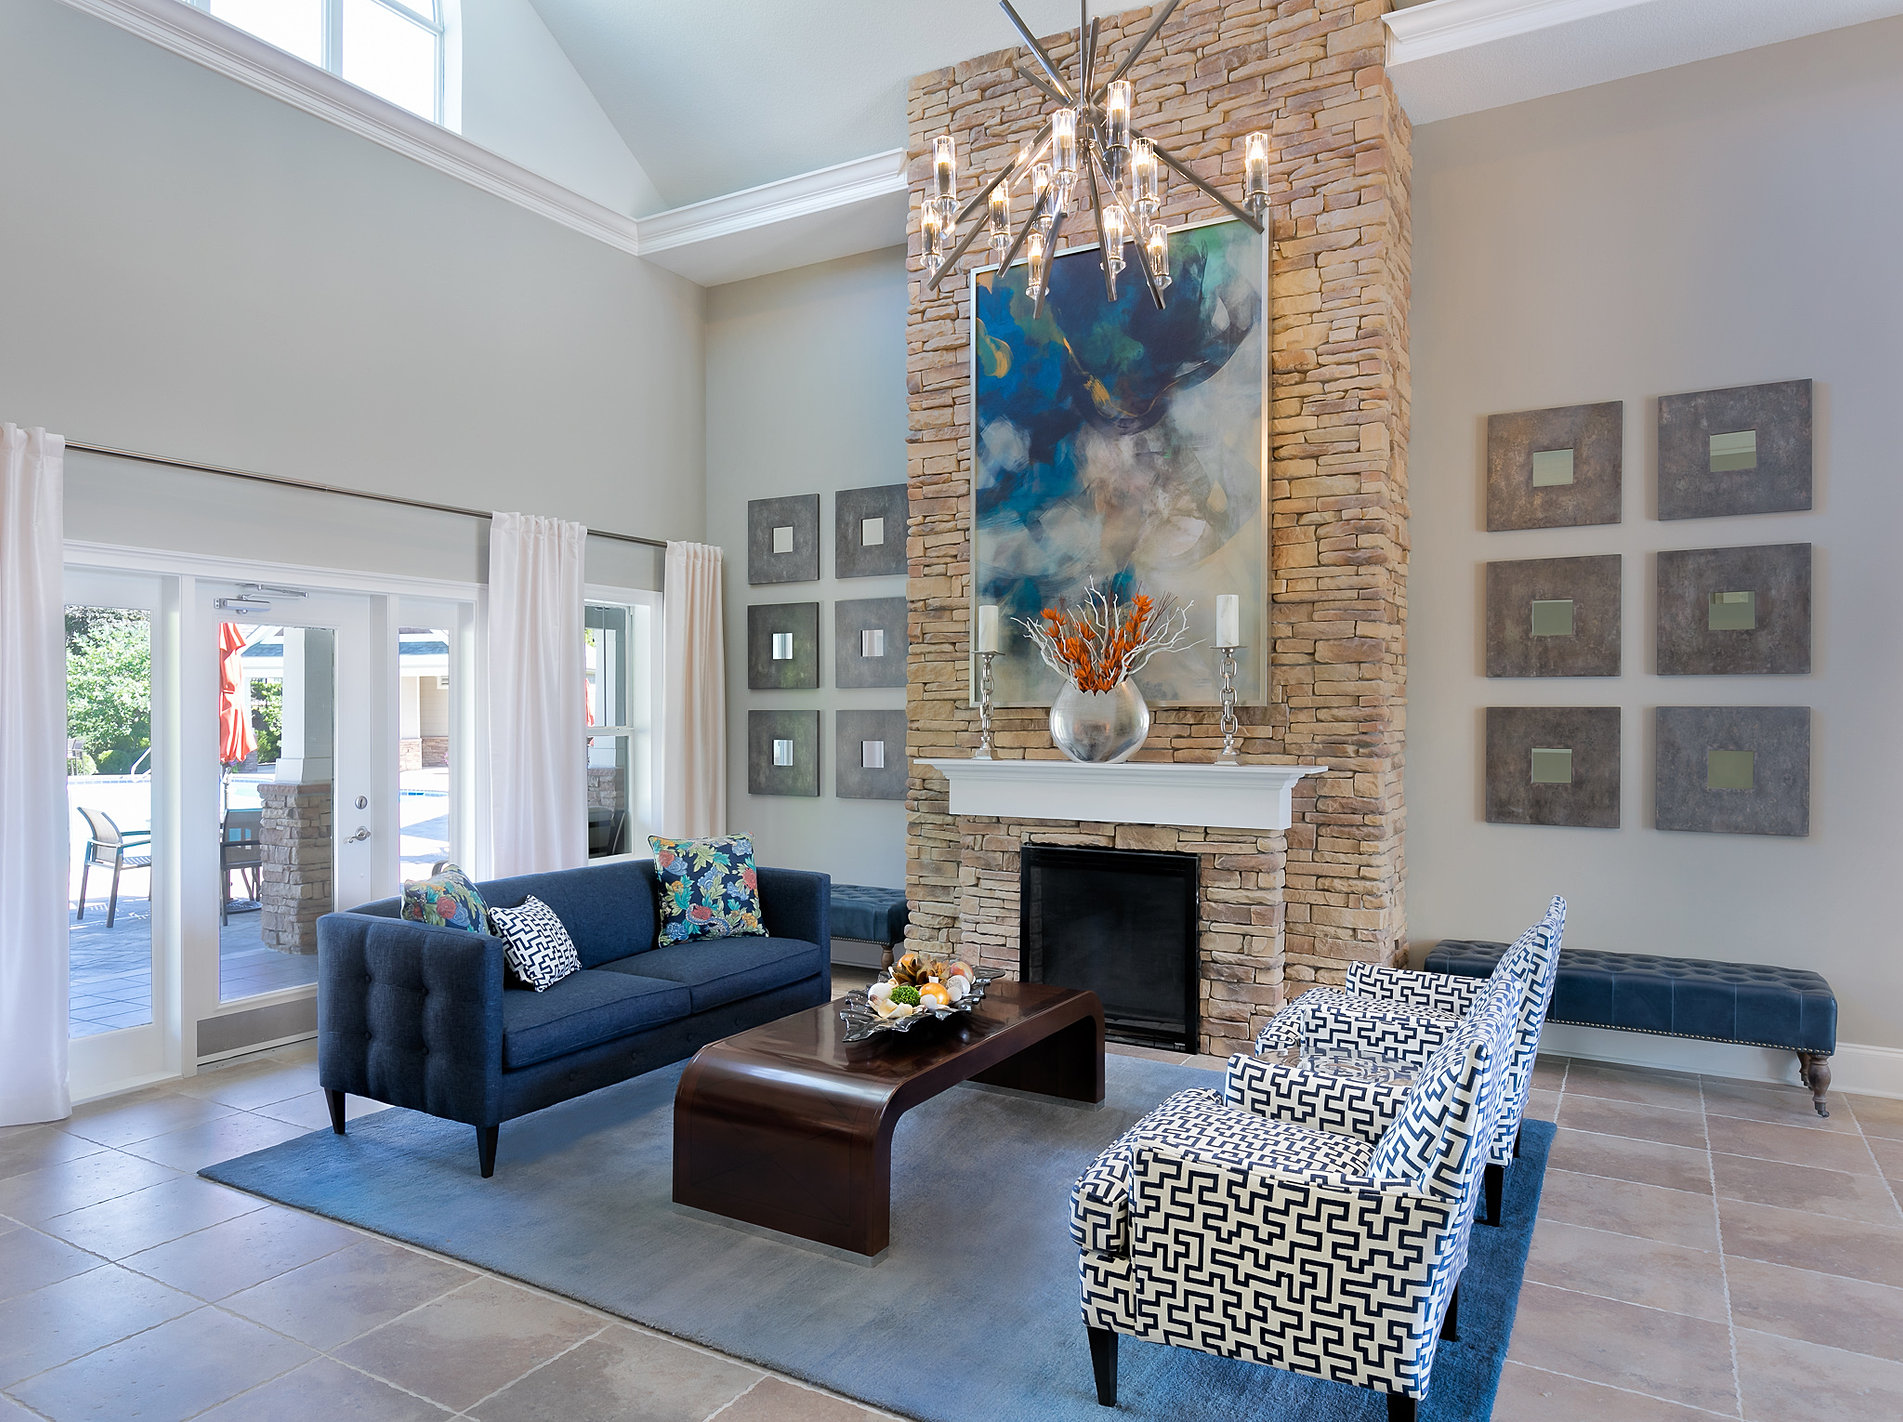 Home michelle ford design kansas city interior designer for Kansas city interior designers